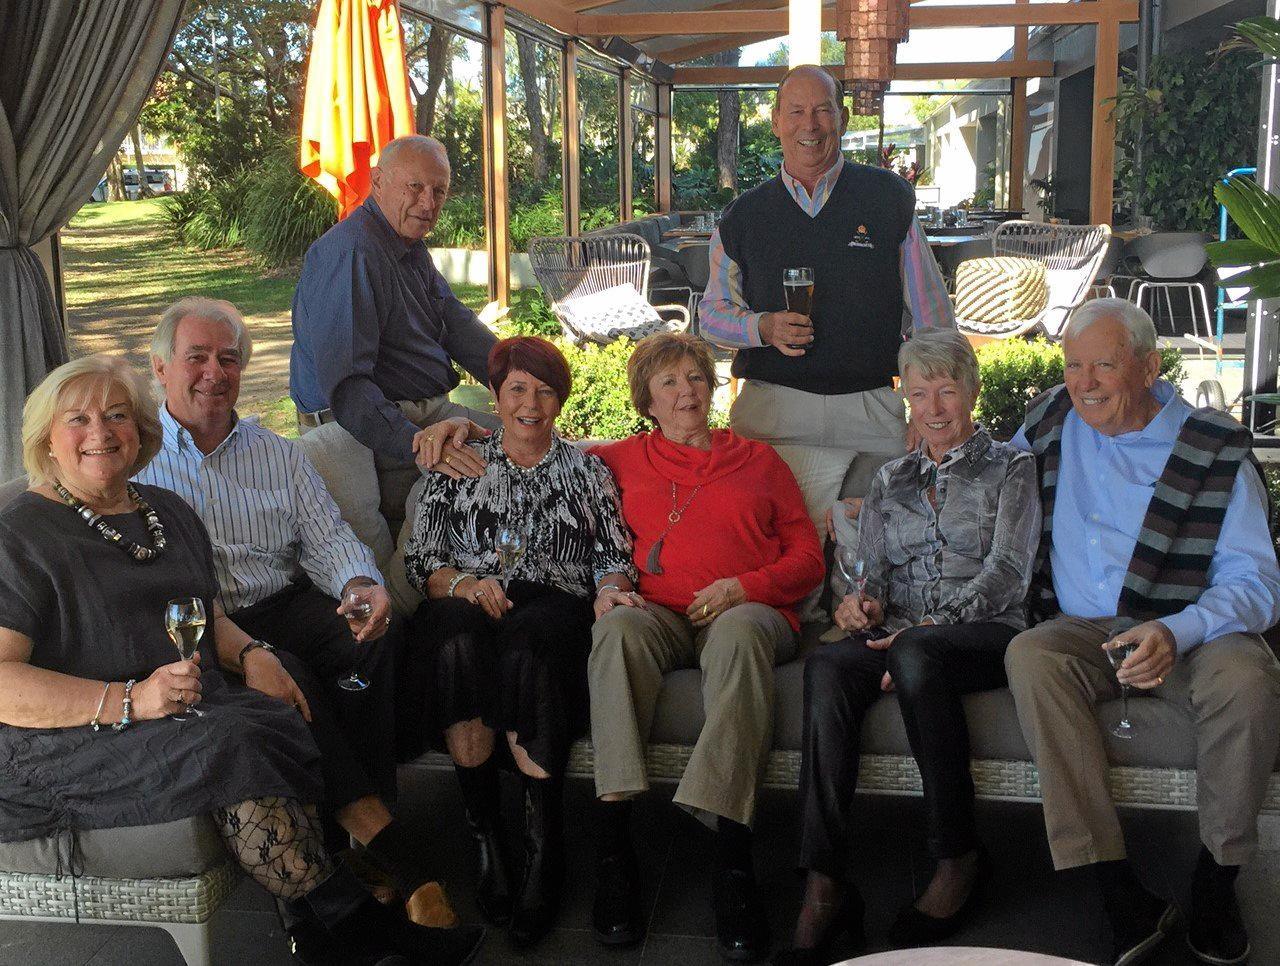 Left to right: Sheila Mason, Peter Mason, Guy Wannop, Sheelagh Wannop, Jeni Webb,Tim Webb, Wendy Ruttan, Doug Ruttan.